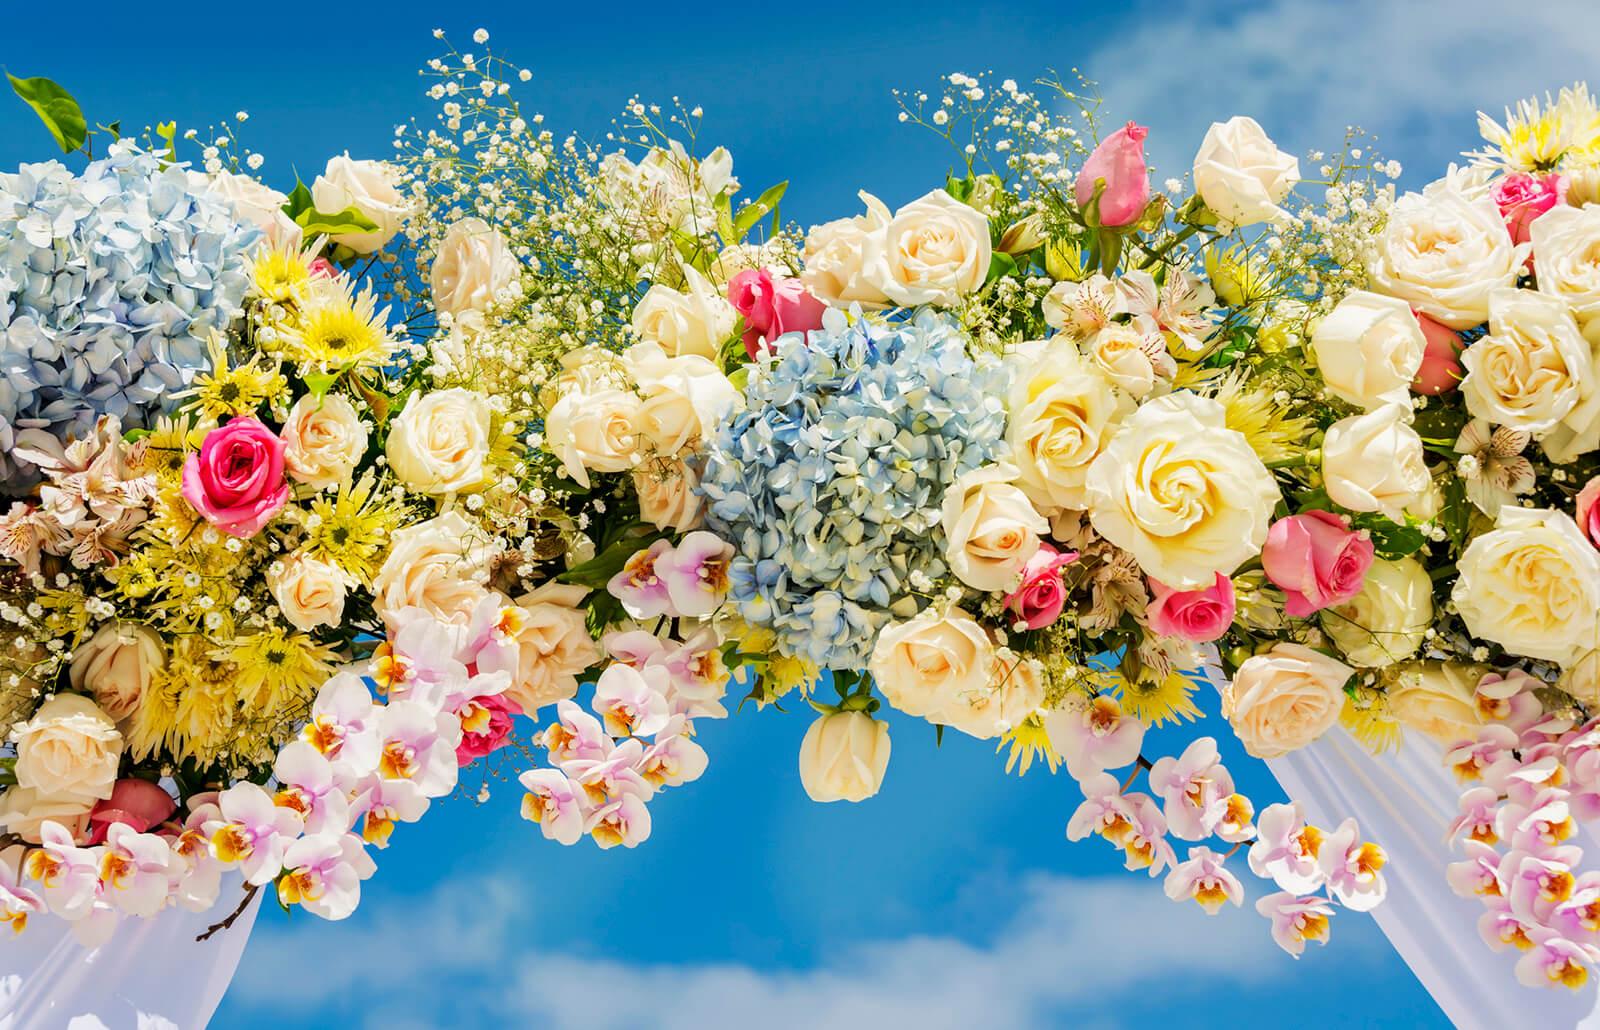 Top 10 Wedding Flowers | LoveToKnow